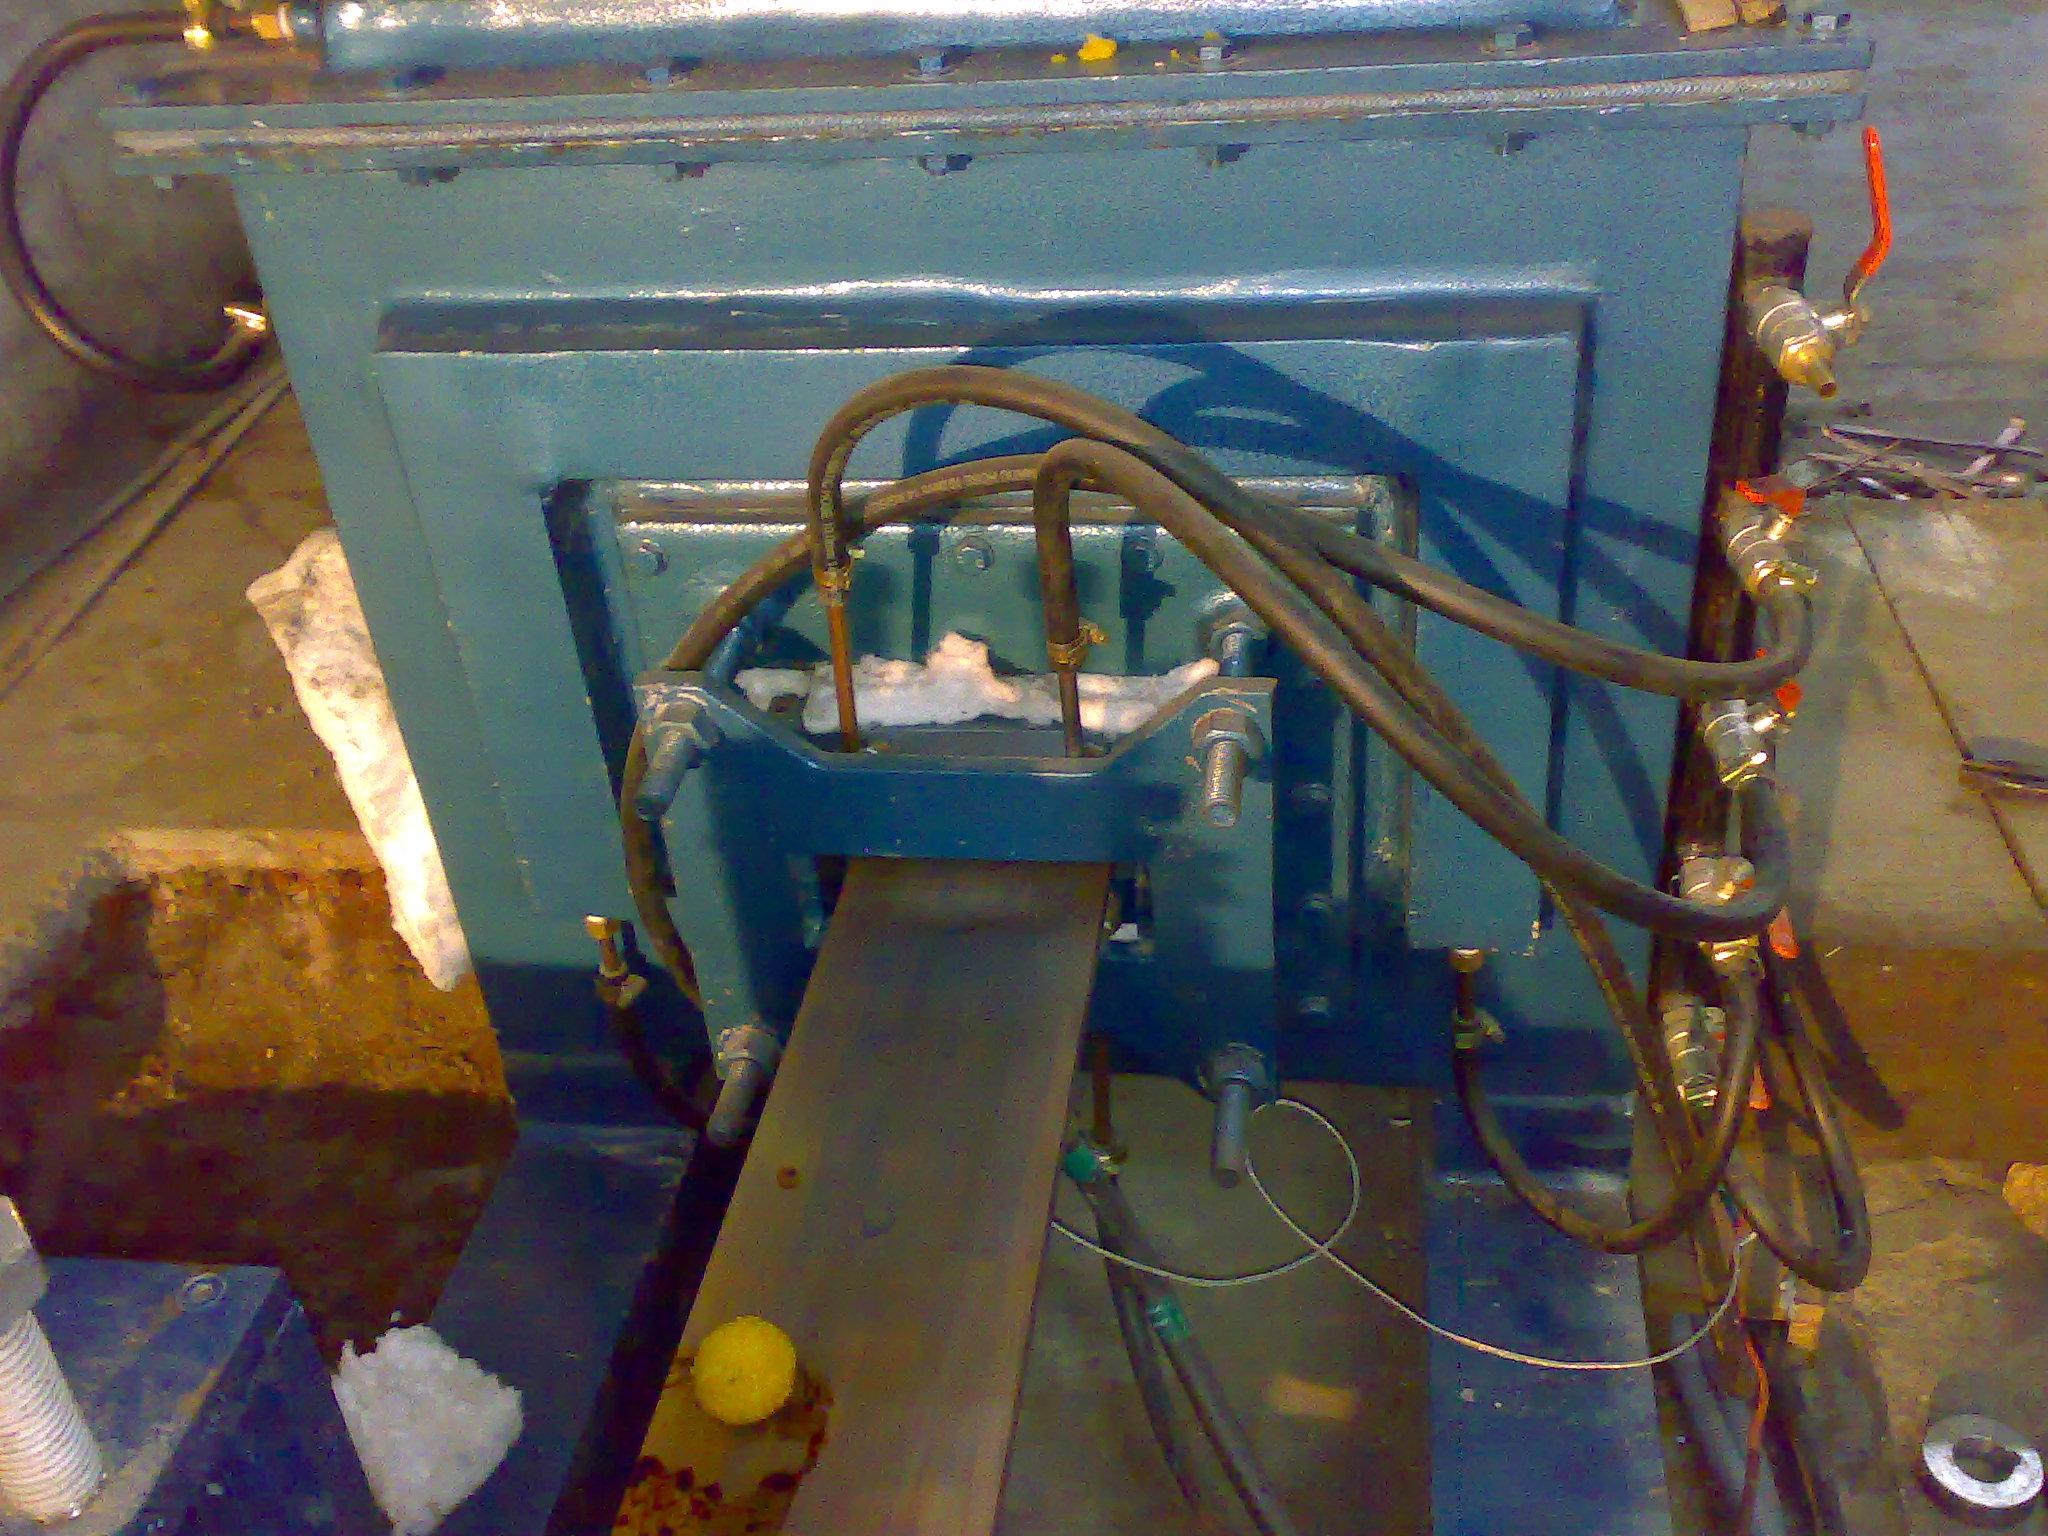 Horizontal Strip Casting Machine